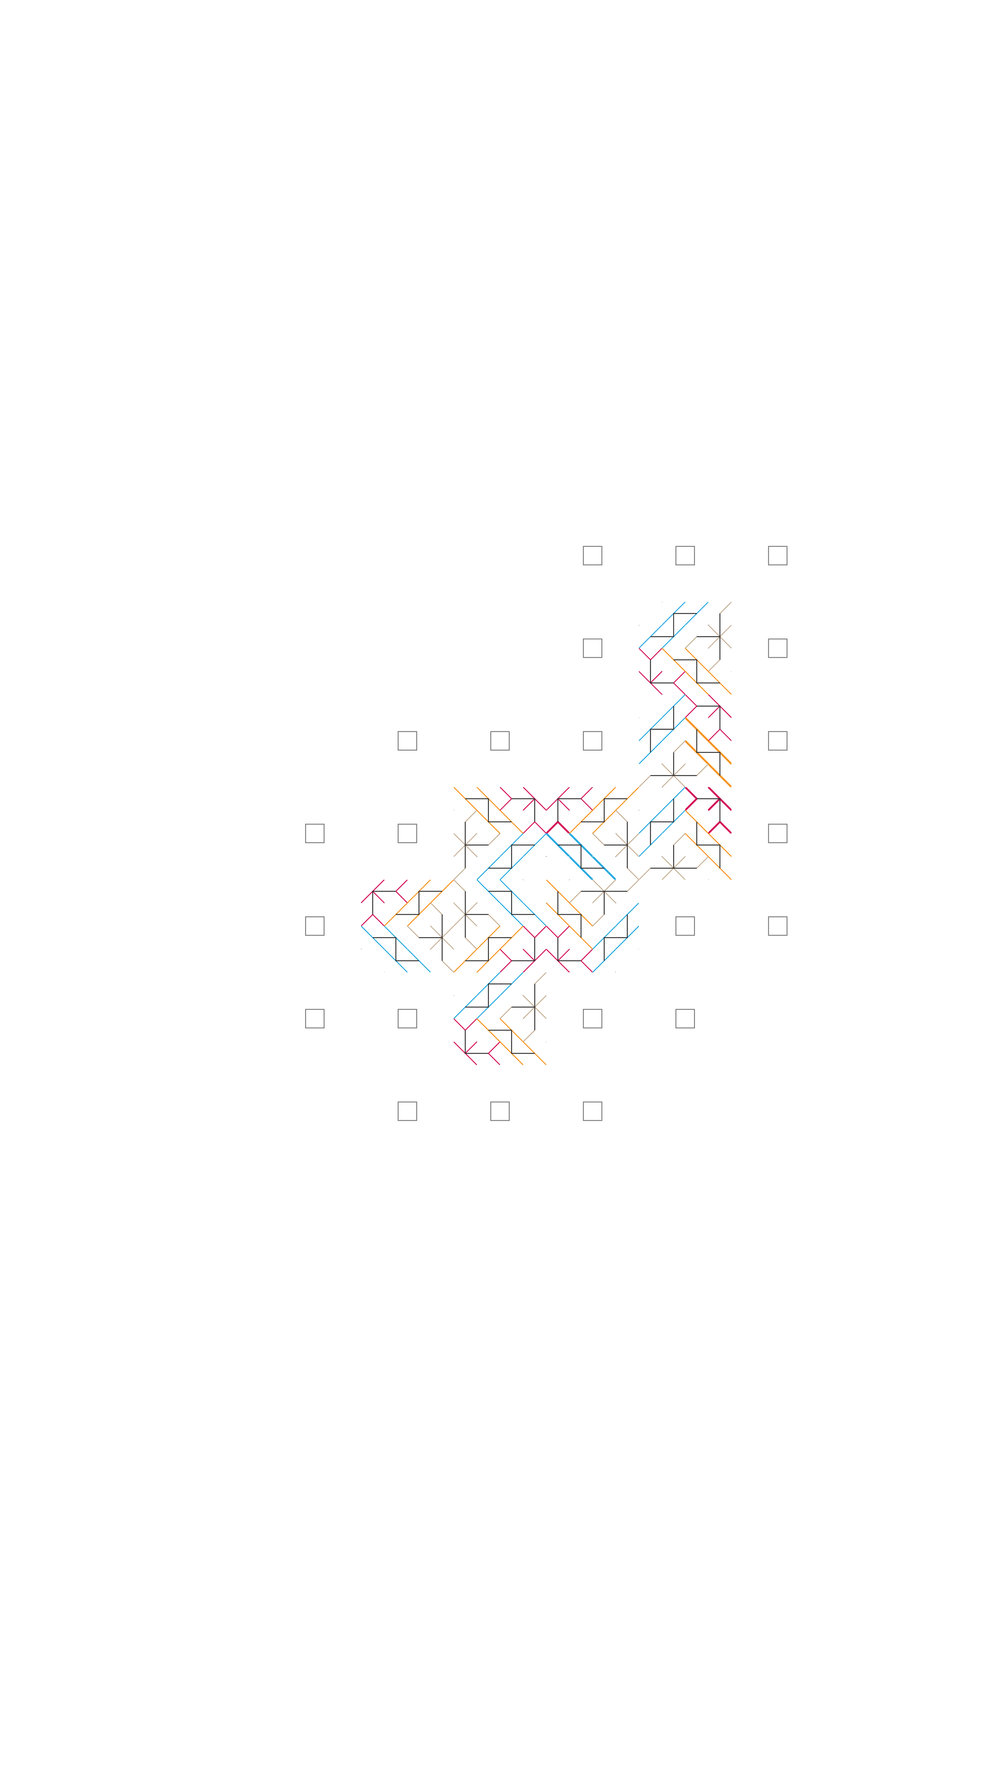 proky experimentation 4-18.jpg